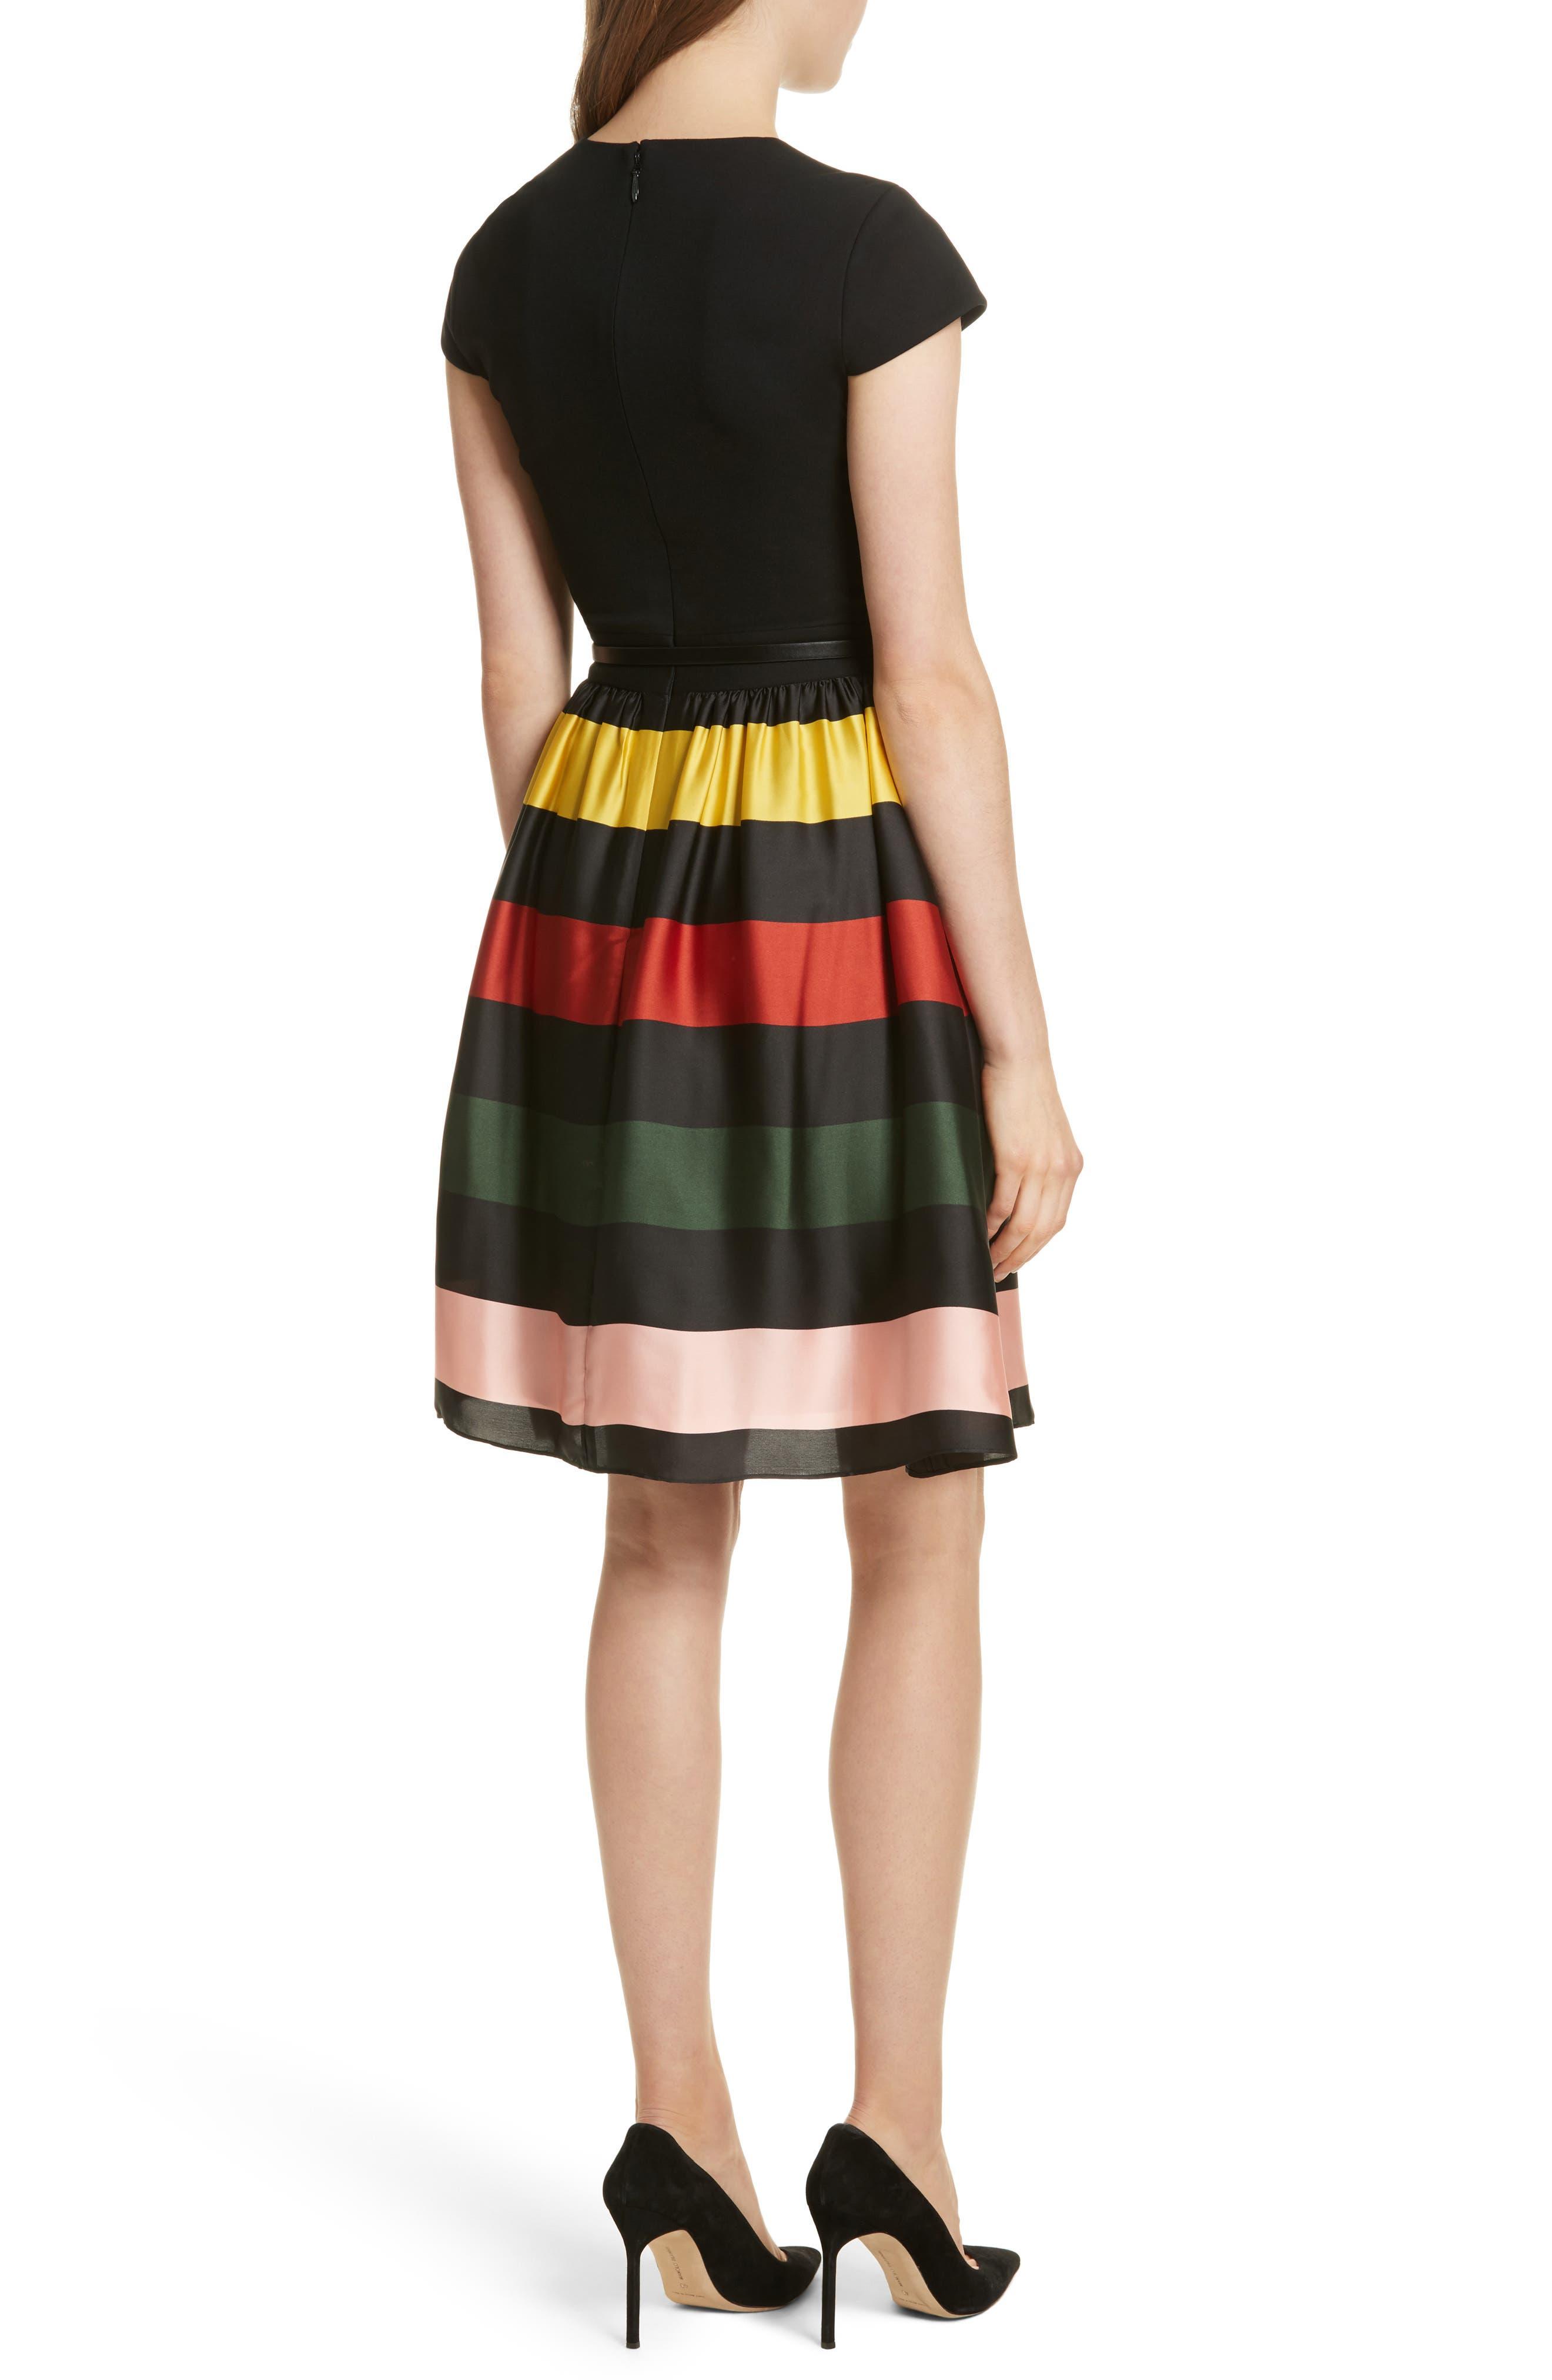 TED BAKER LONDON,                             Cruise Stripe Fit & Flare Dress,                             Alternate thumbnail 2, color,                             001